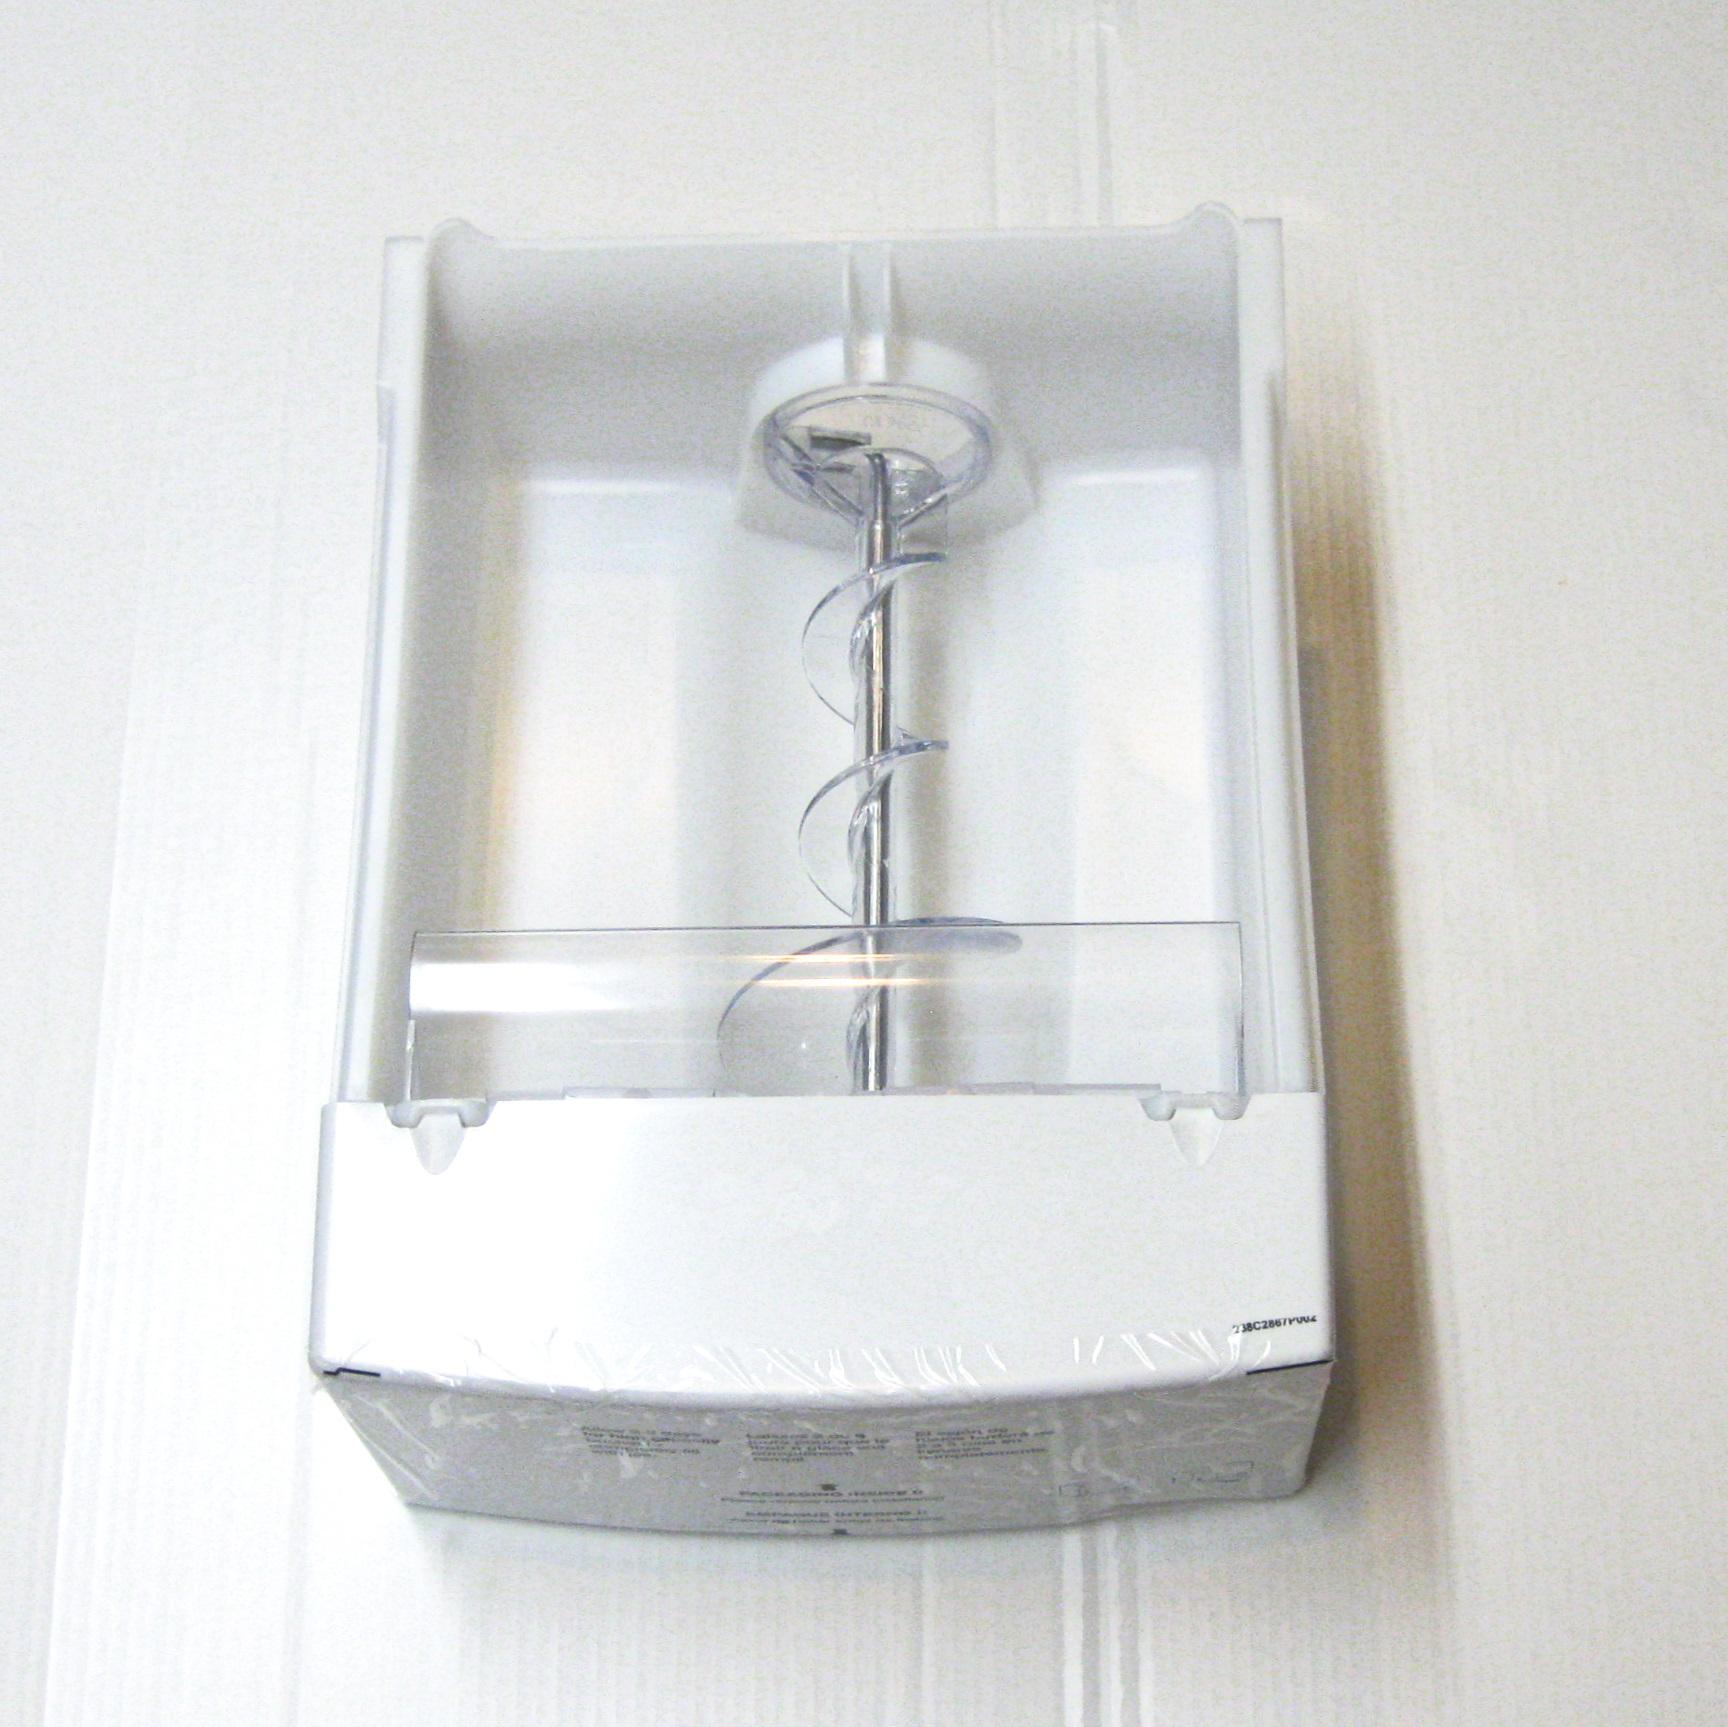 WR17X12091 Genuine GE Refrigerator Freezer Ice Bucket Auger AP3884278 PS1022067